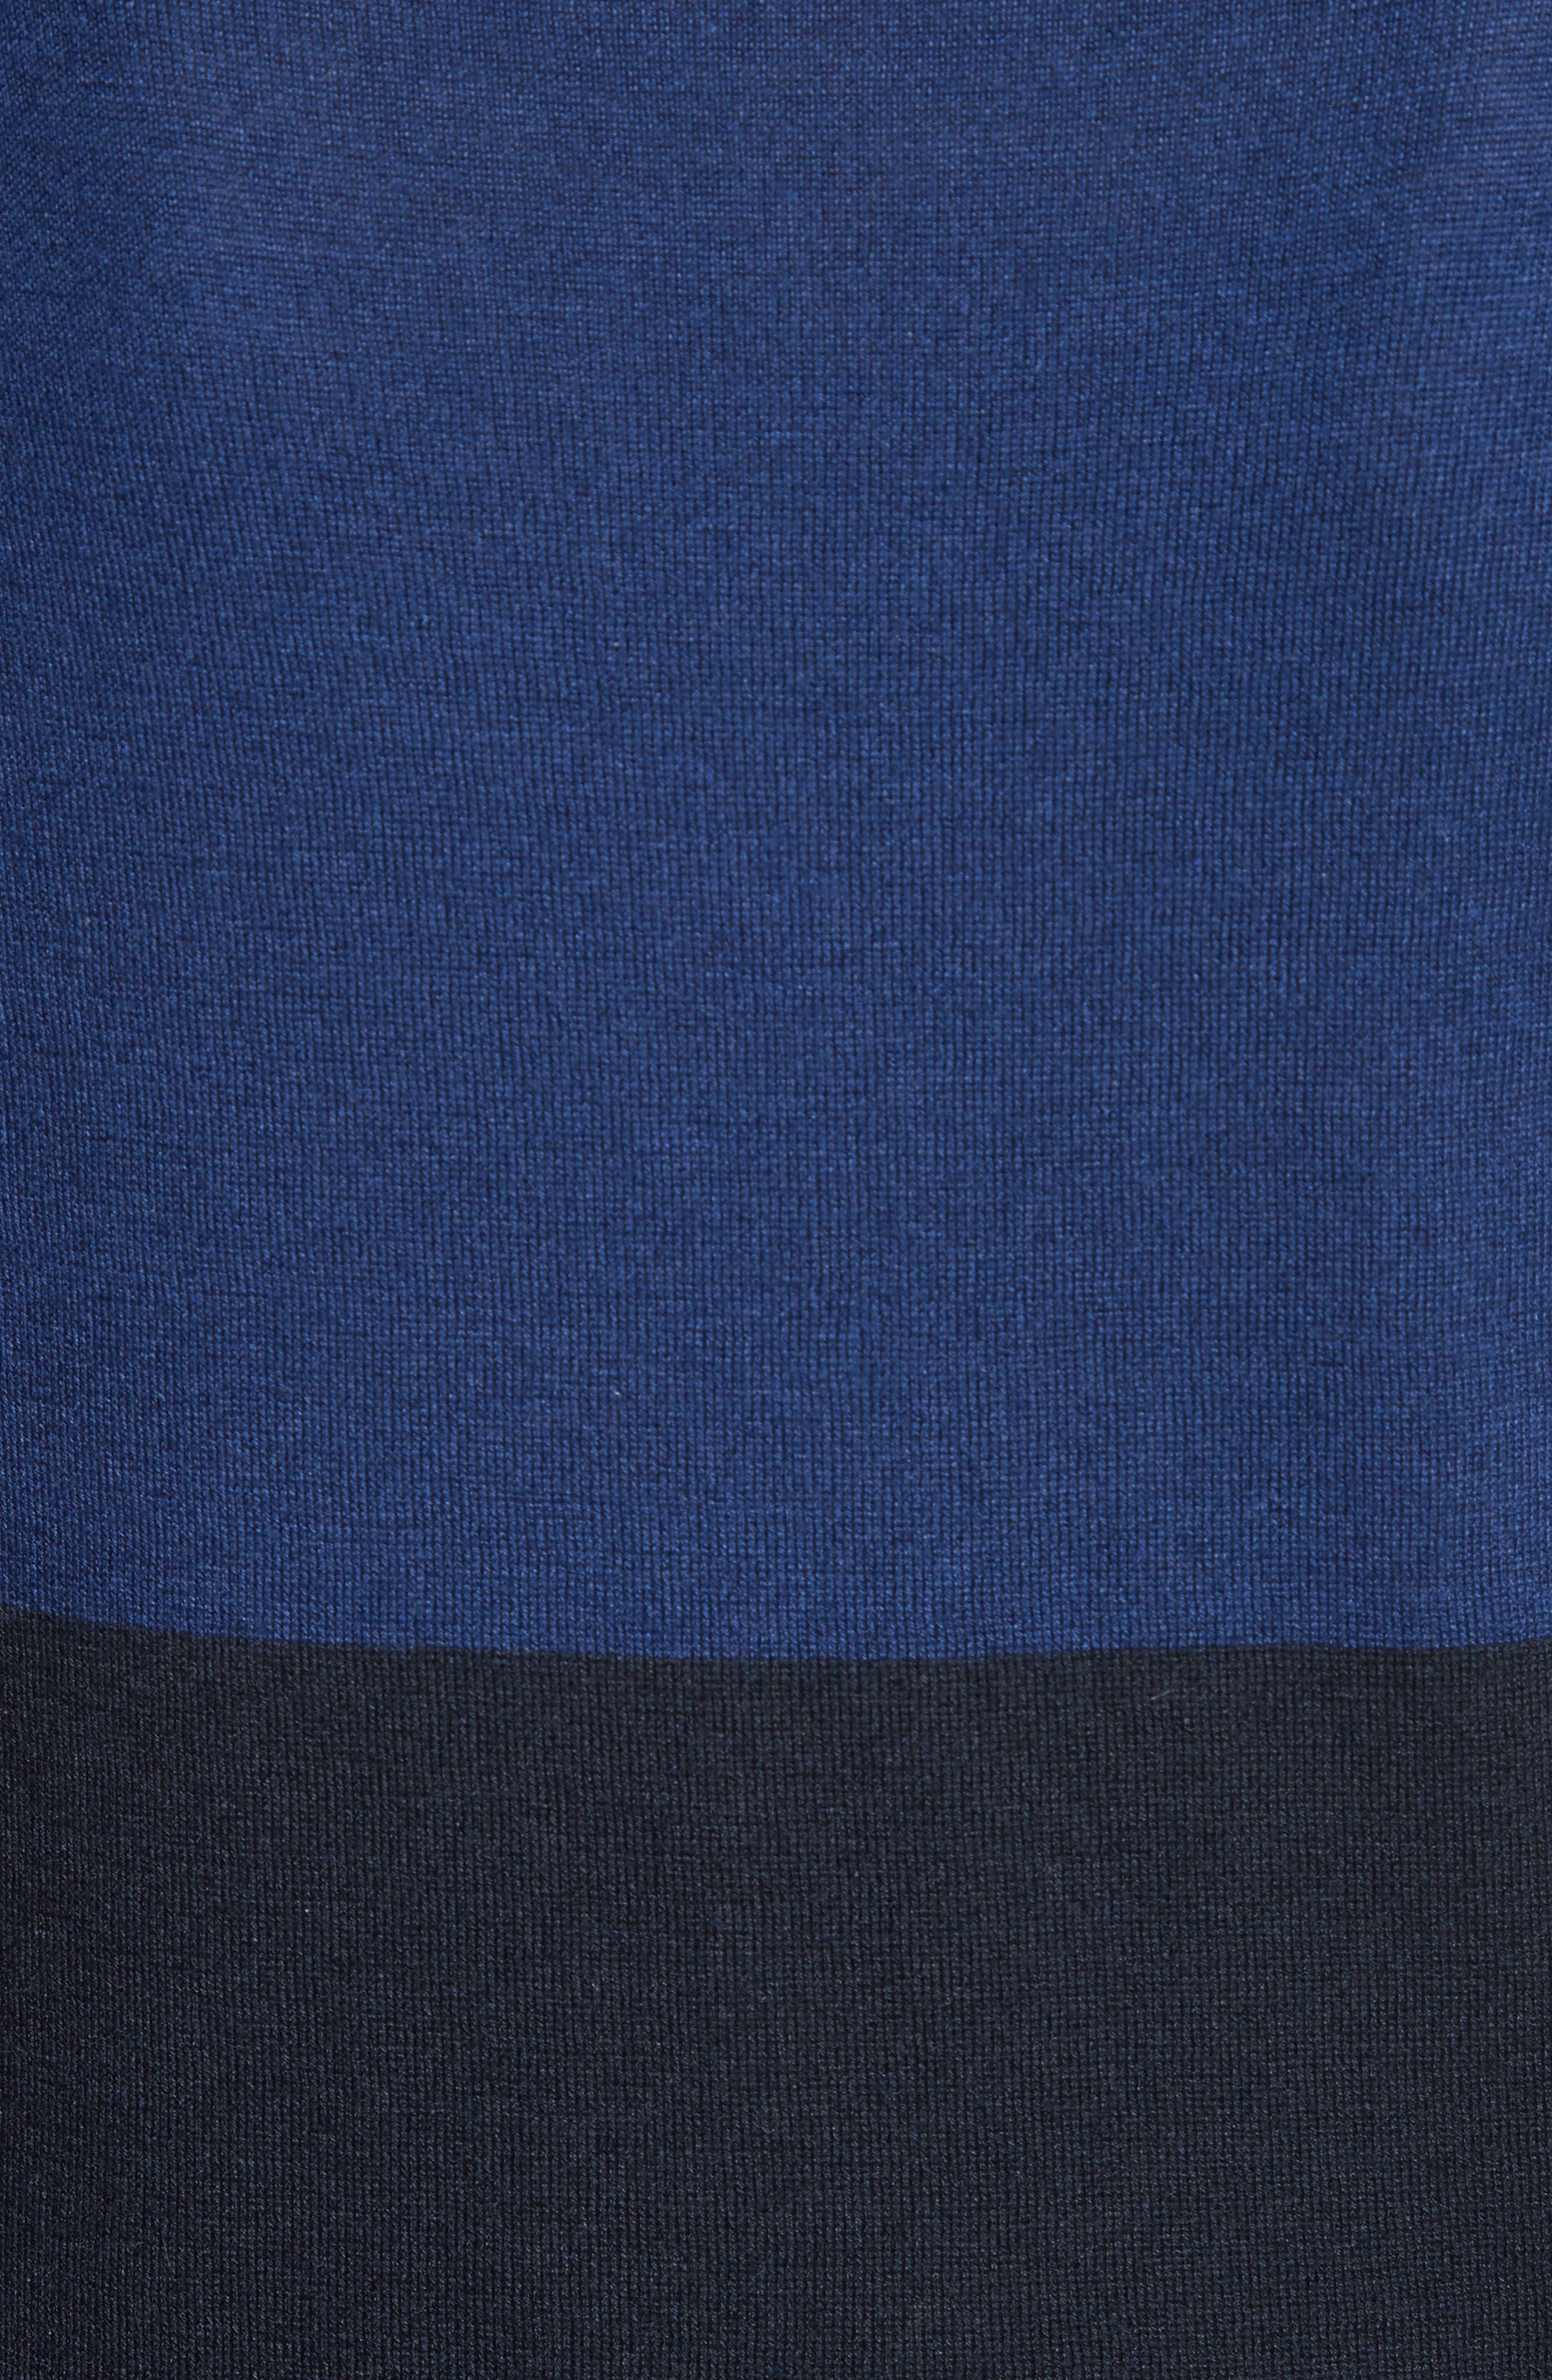 Colimbo Silk & Cashmere Top,                             Alternate thumbnail 5, color,                             411